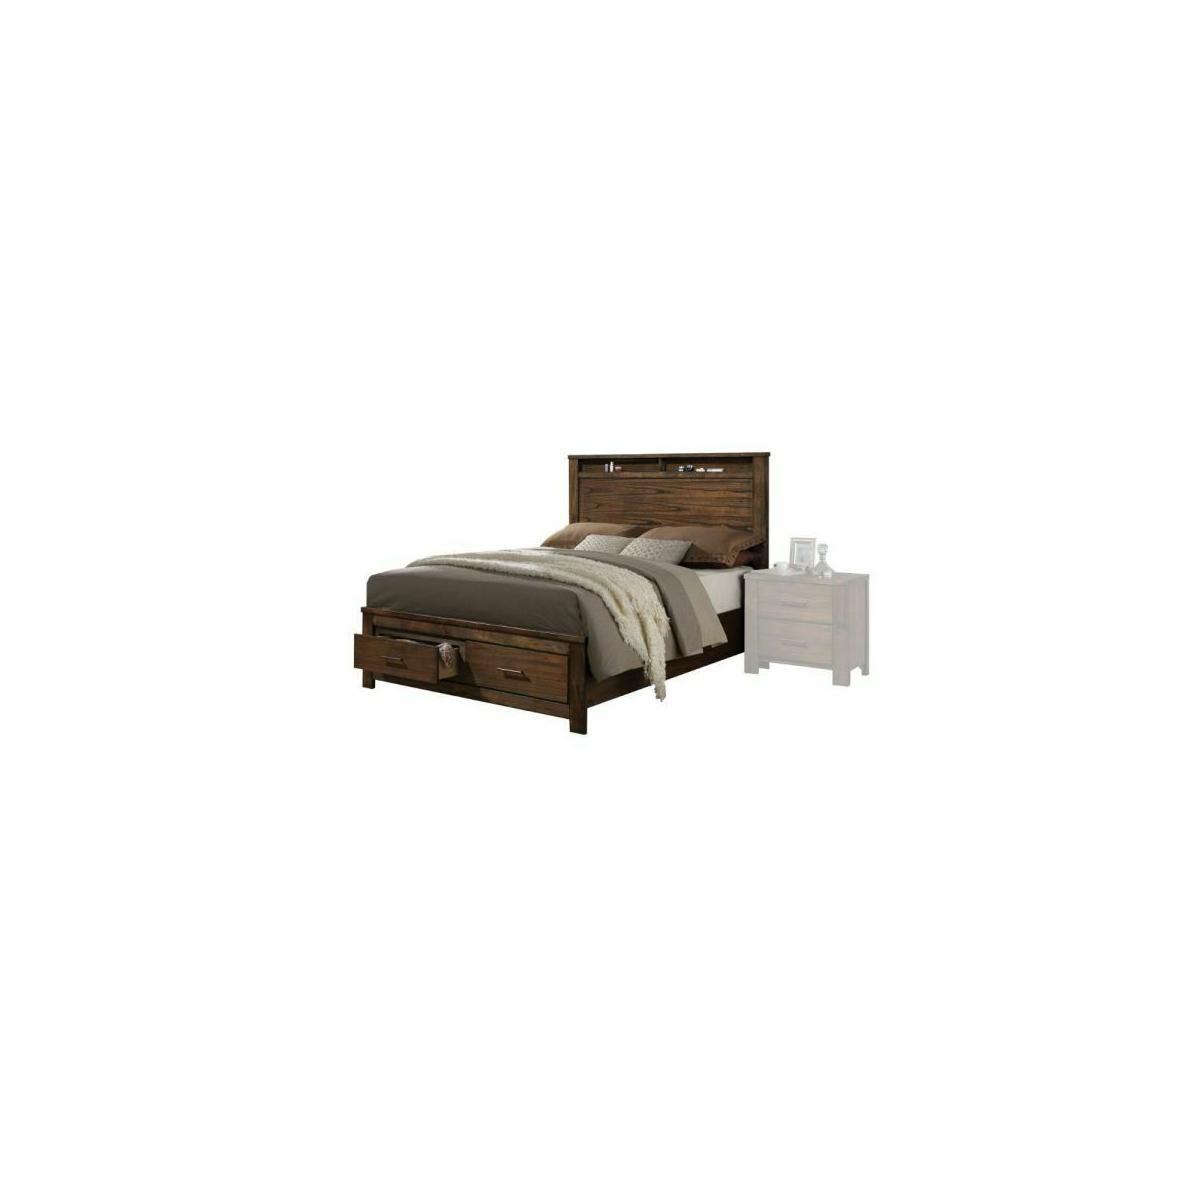 ACME Merrilee Eastern King Bed w/Storage - 21677EK - Oak